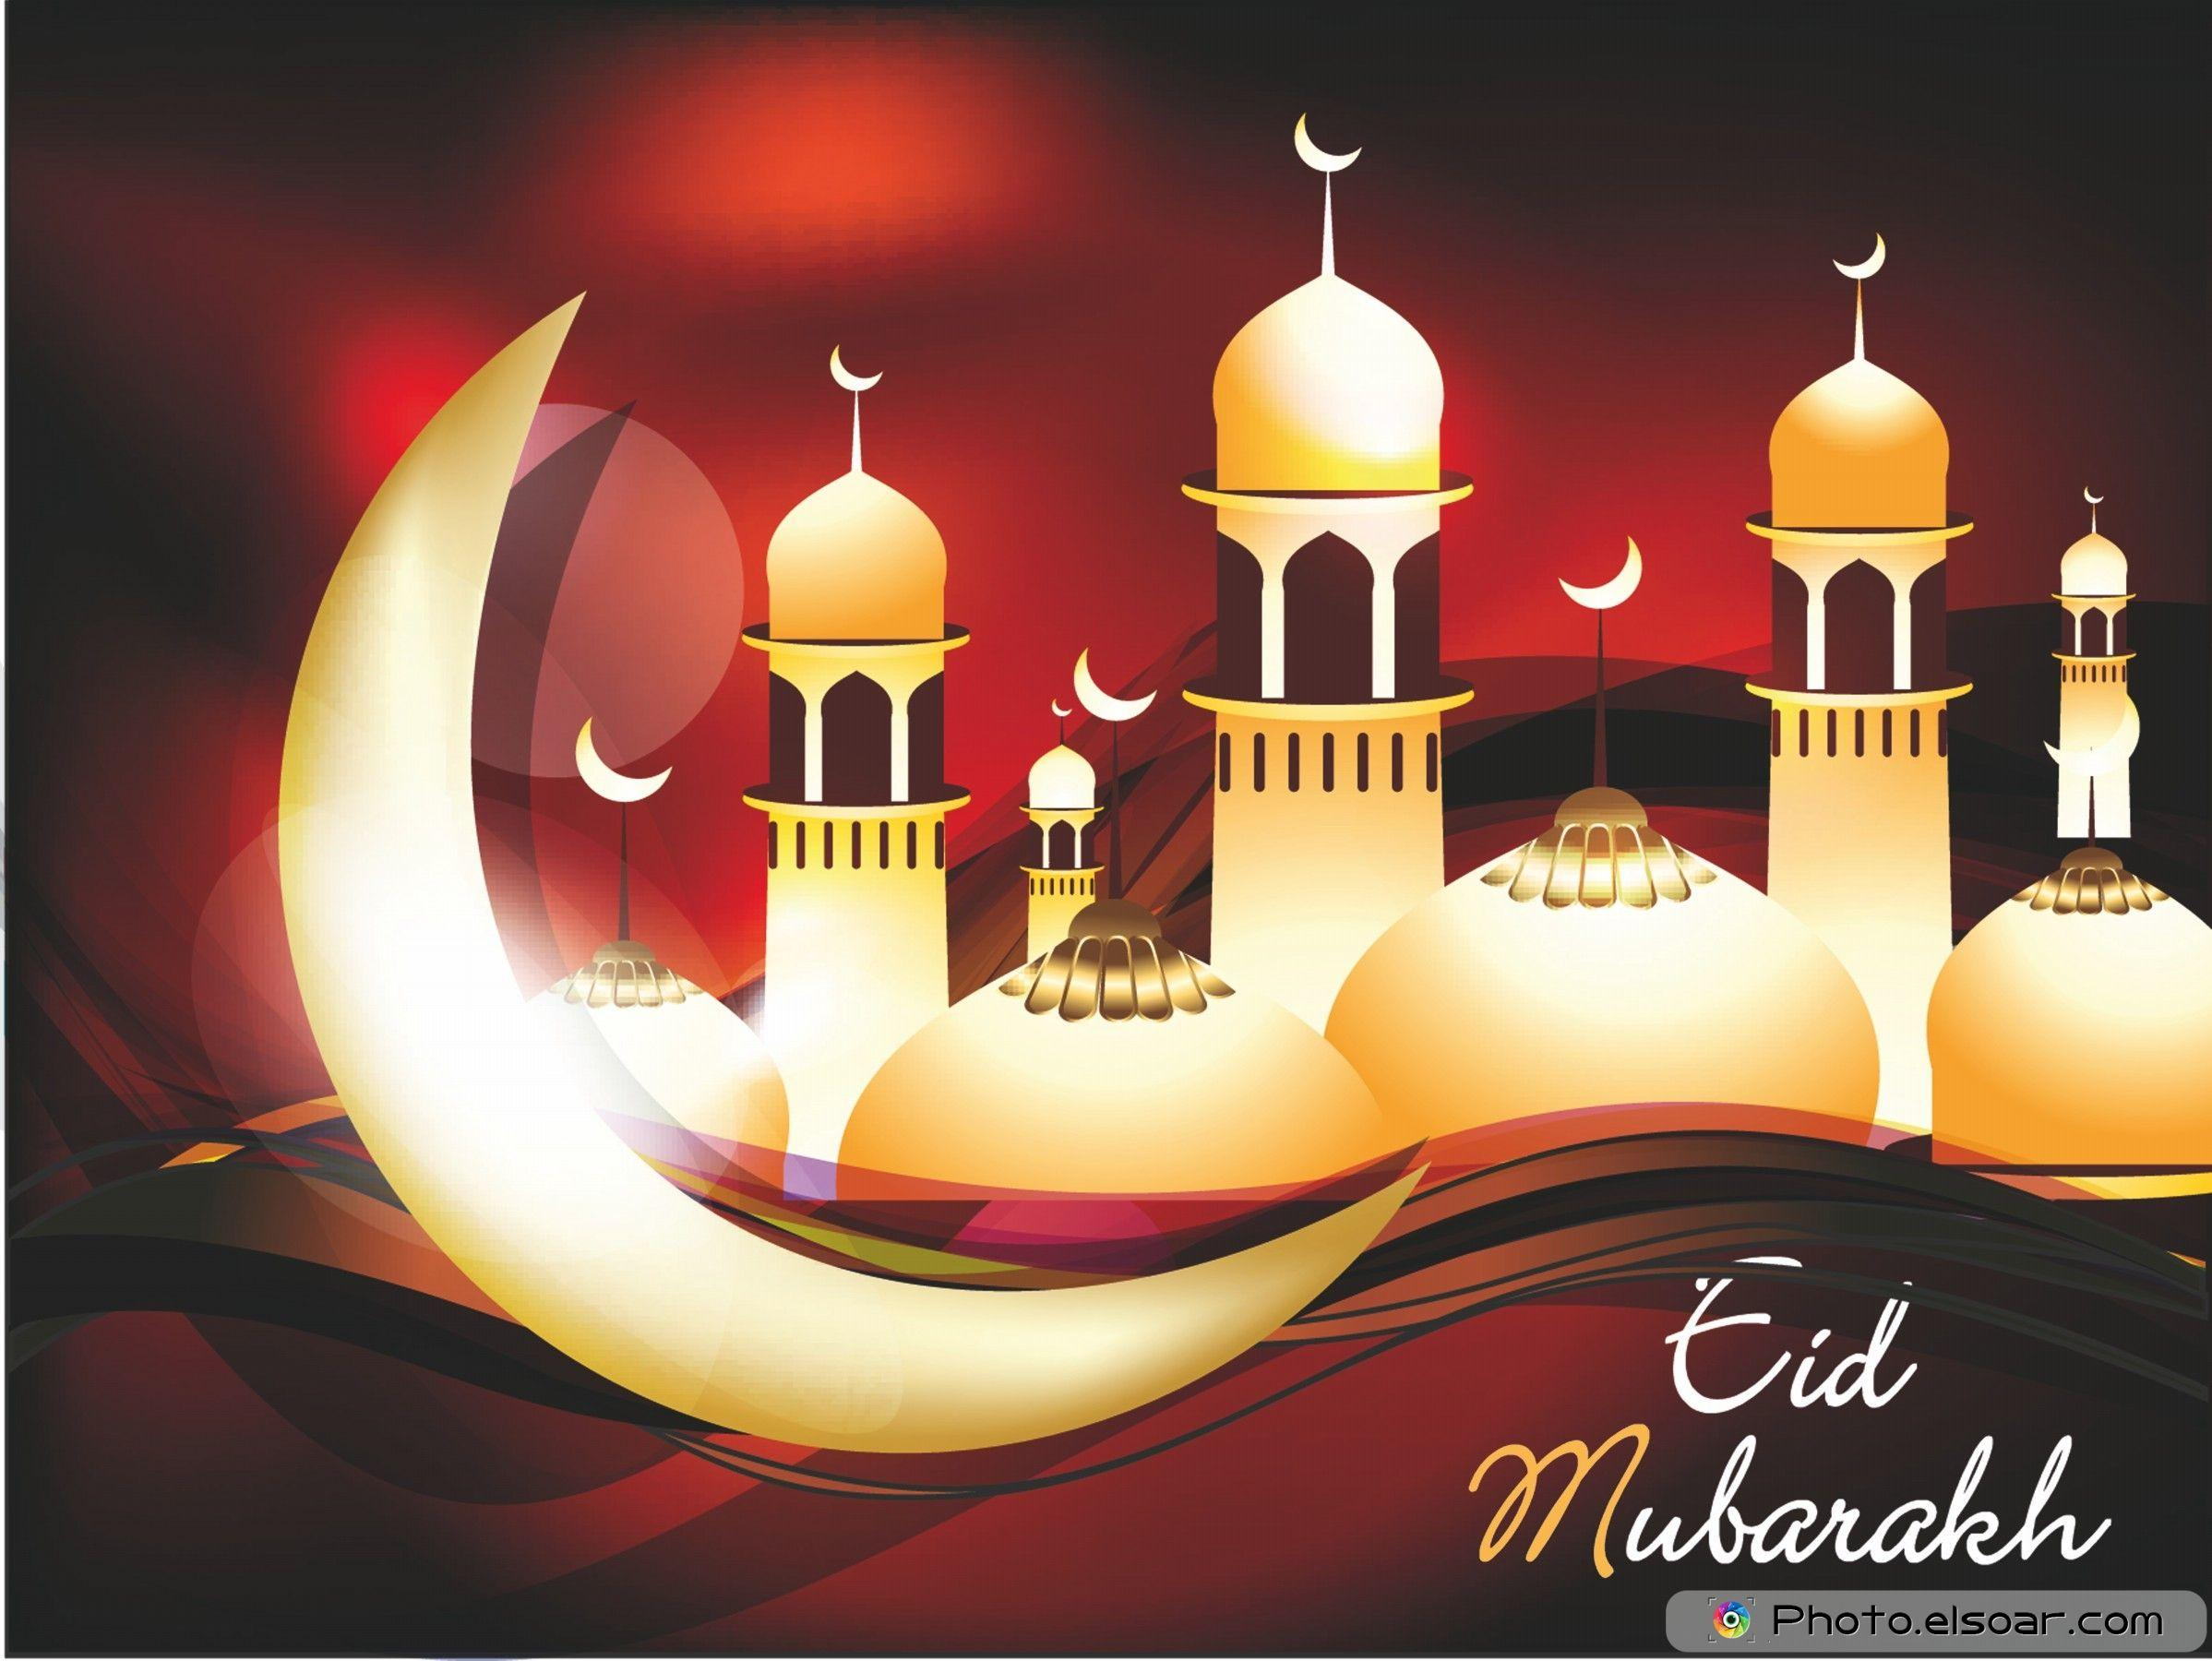 eid mubarak hd wallpapers - wallpaper cave